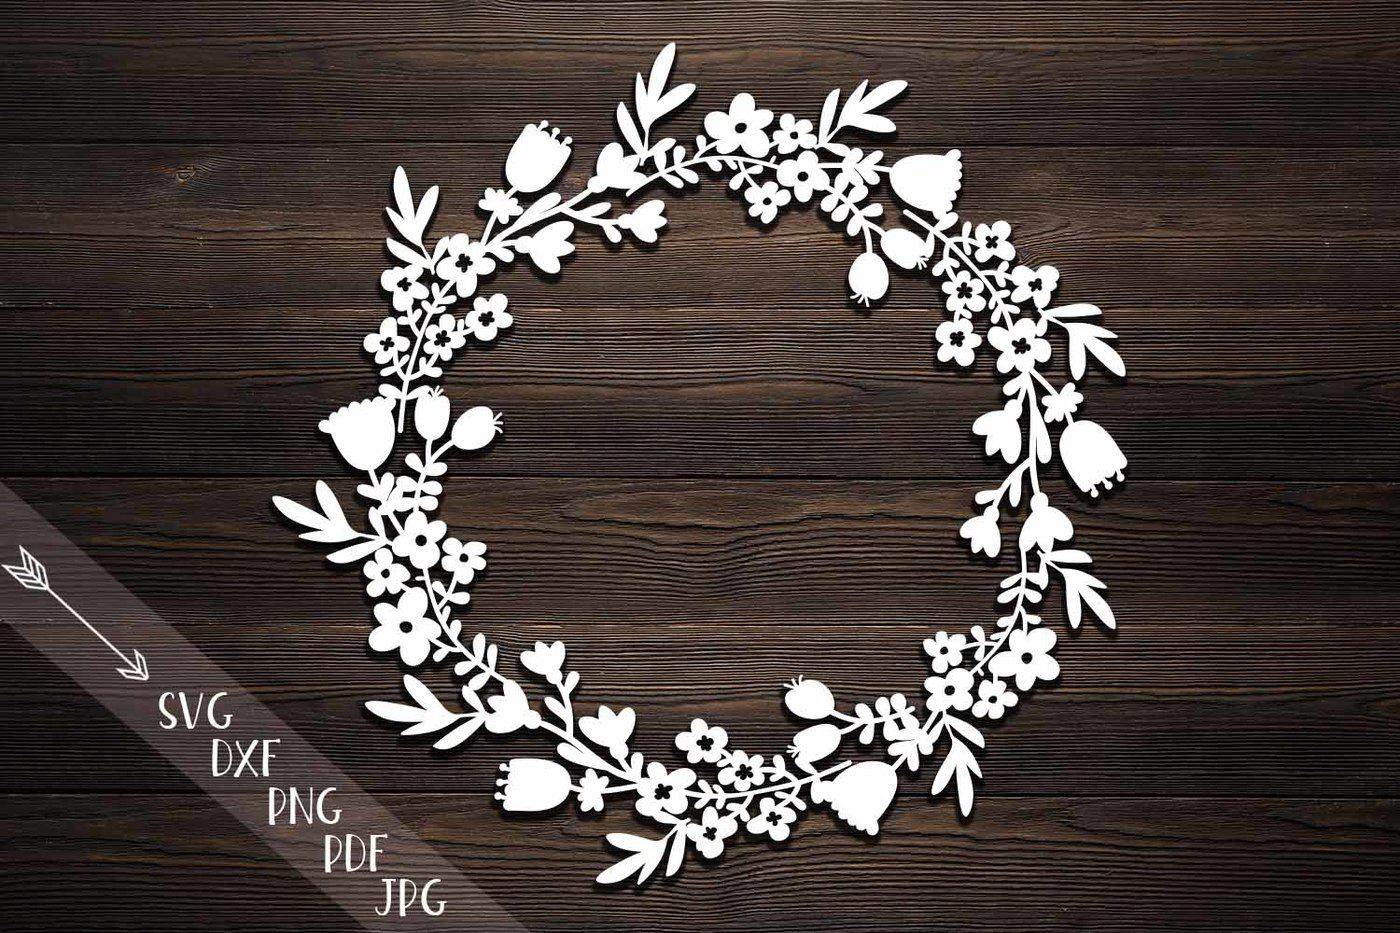 Flower Wreath Paper Cut Svg Monogram Flowers Papercutting